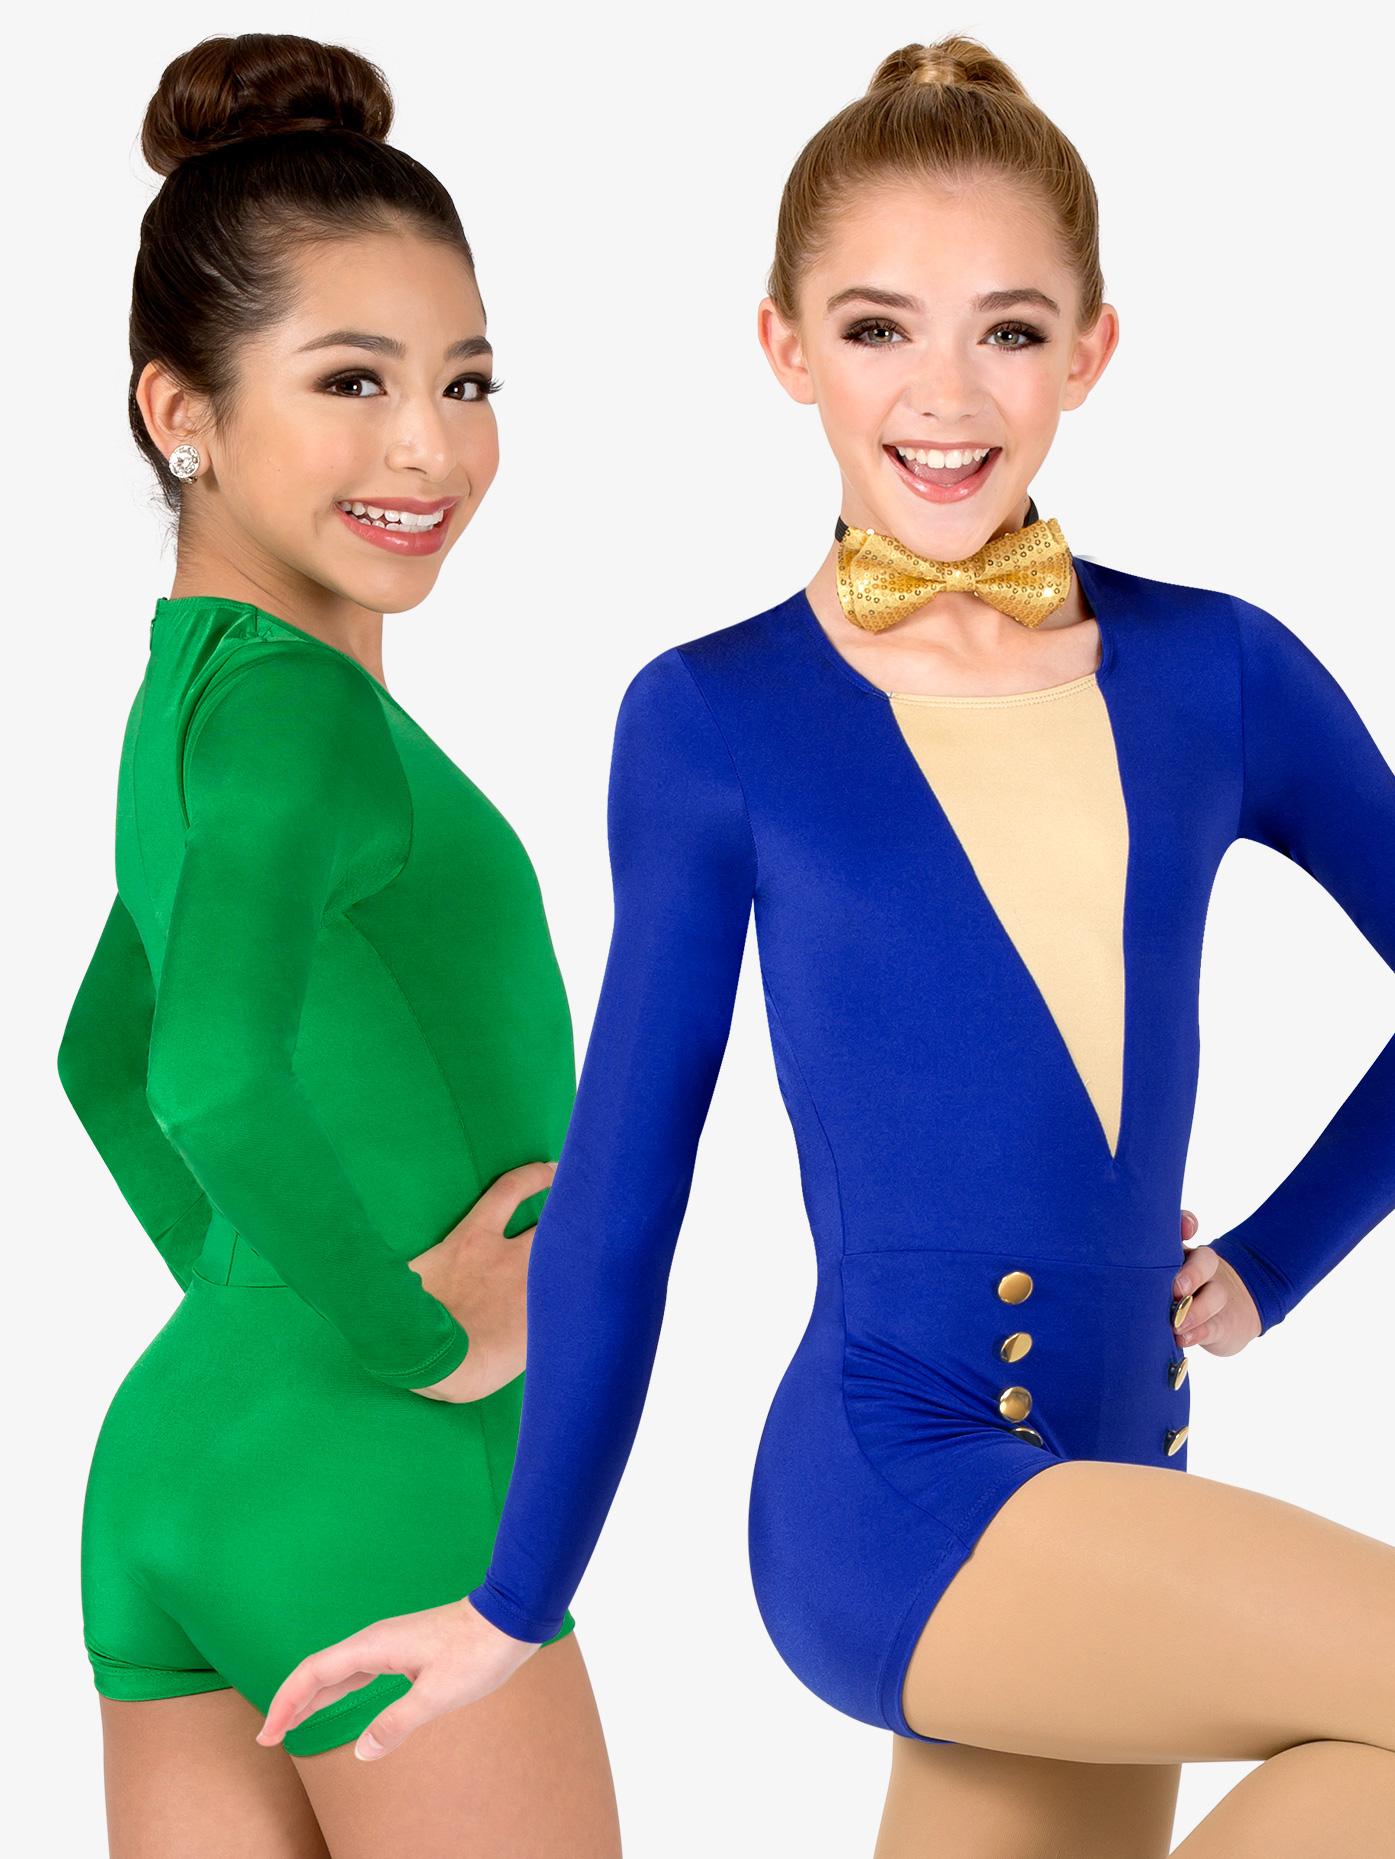 Double Platinum Girls Performance Long Sleeve Shorty Unitard N7566C